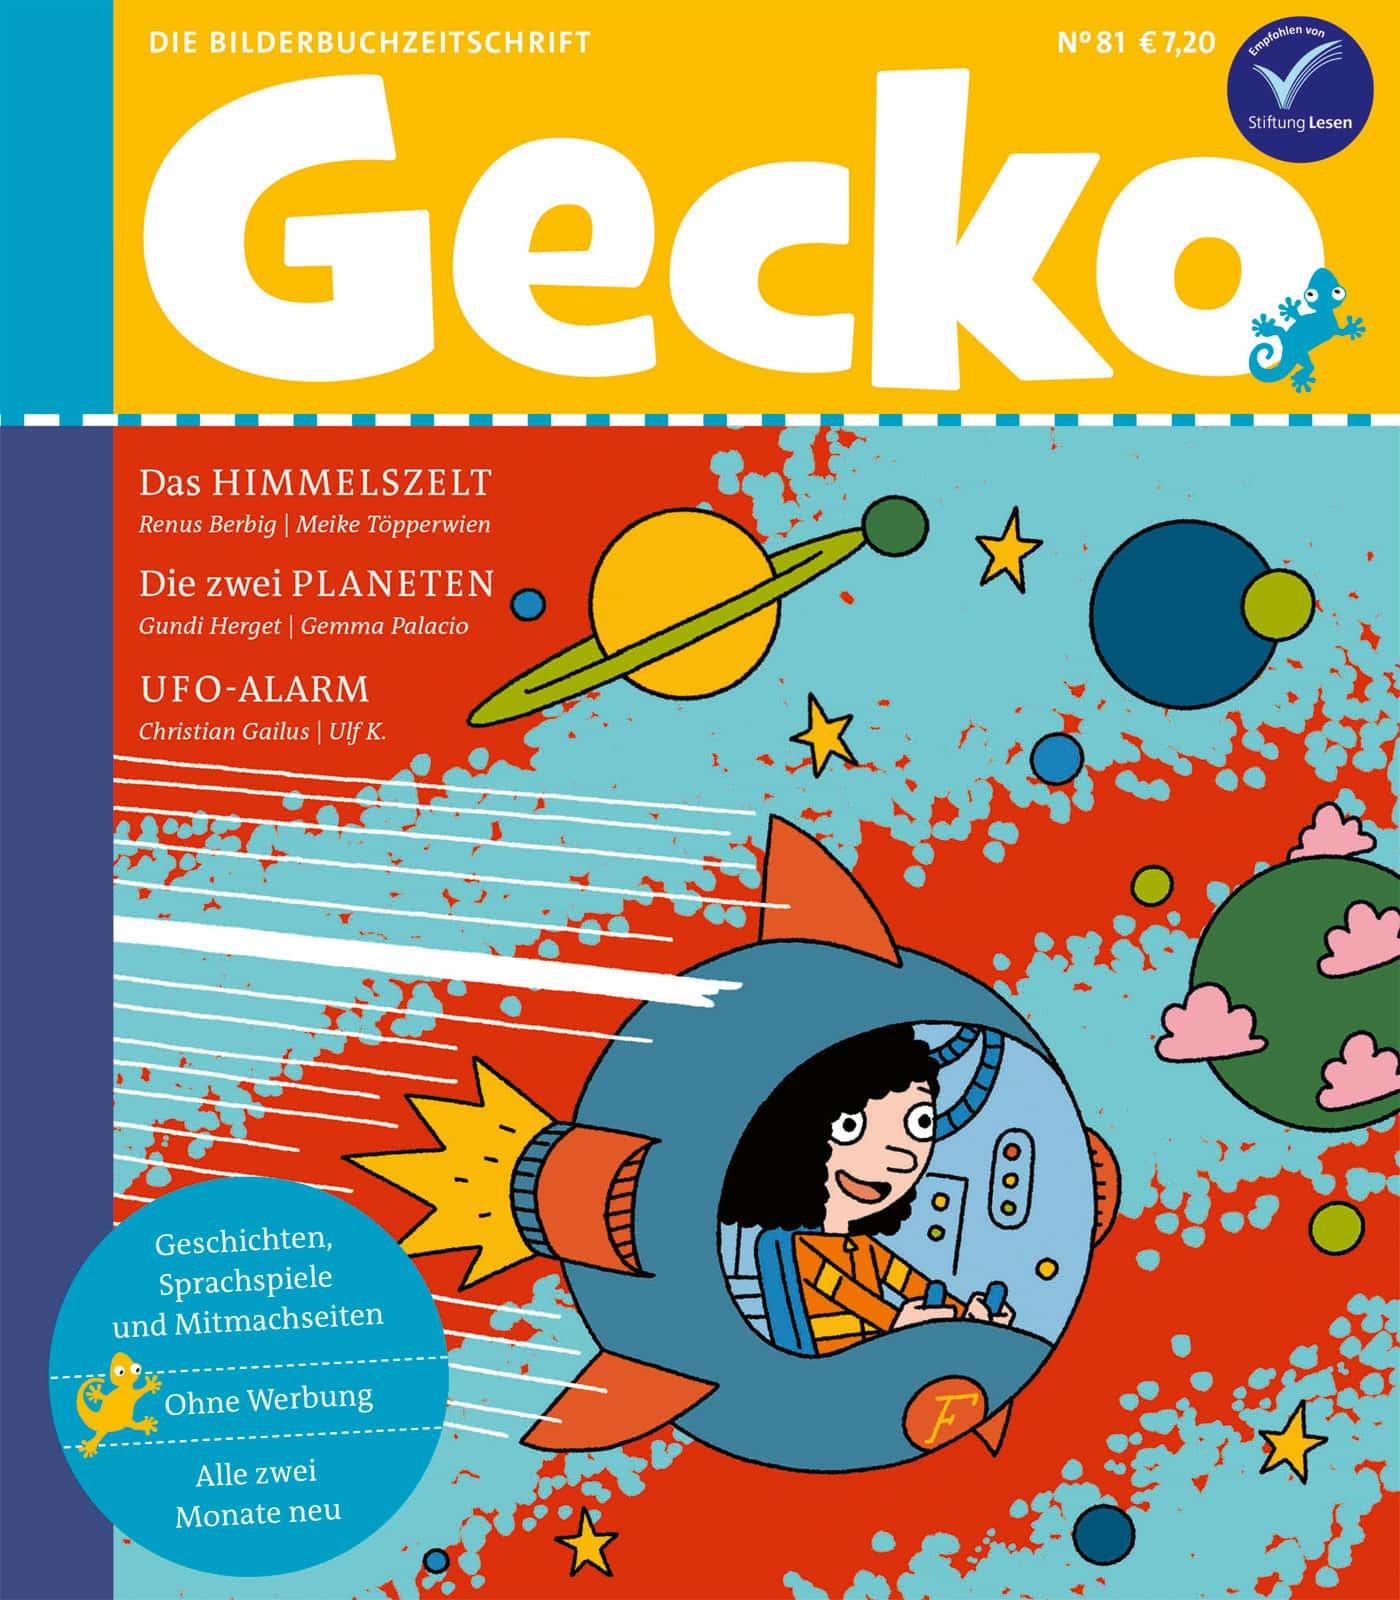 HIMBEER Abo mit Gecko Kinderzeitschrift als Aboprämie // HIMBEER